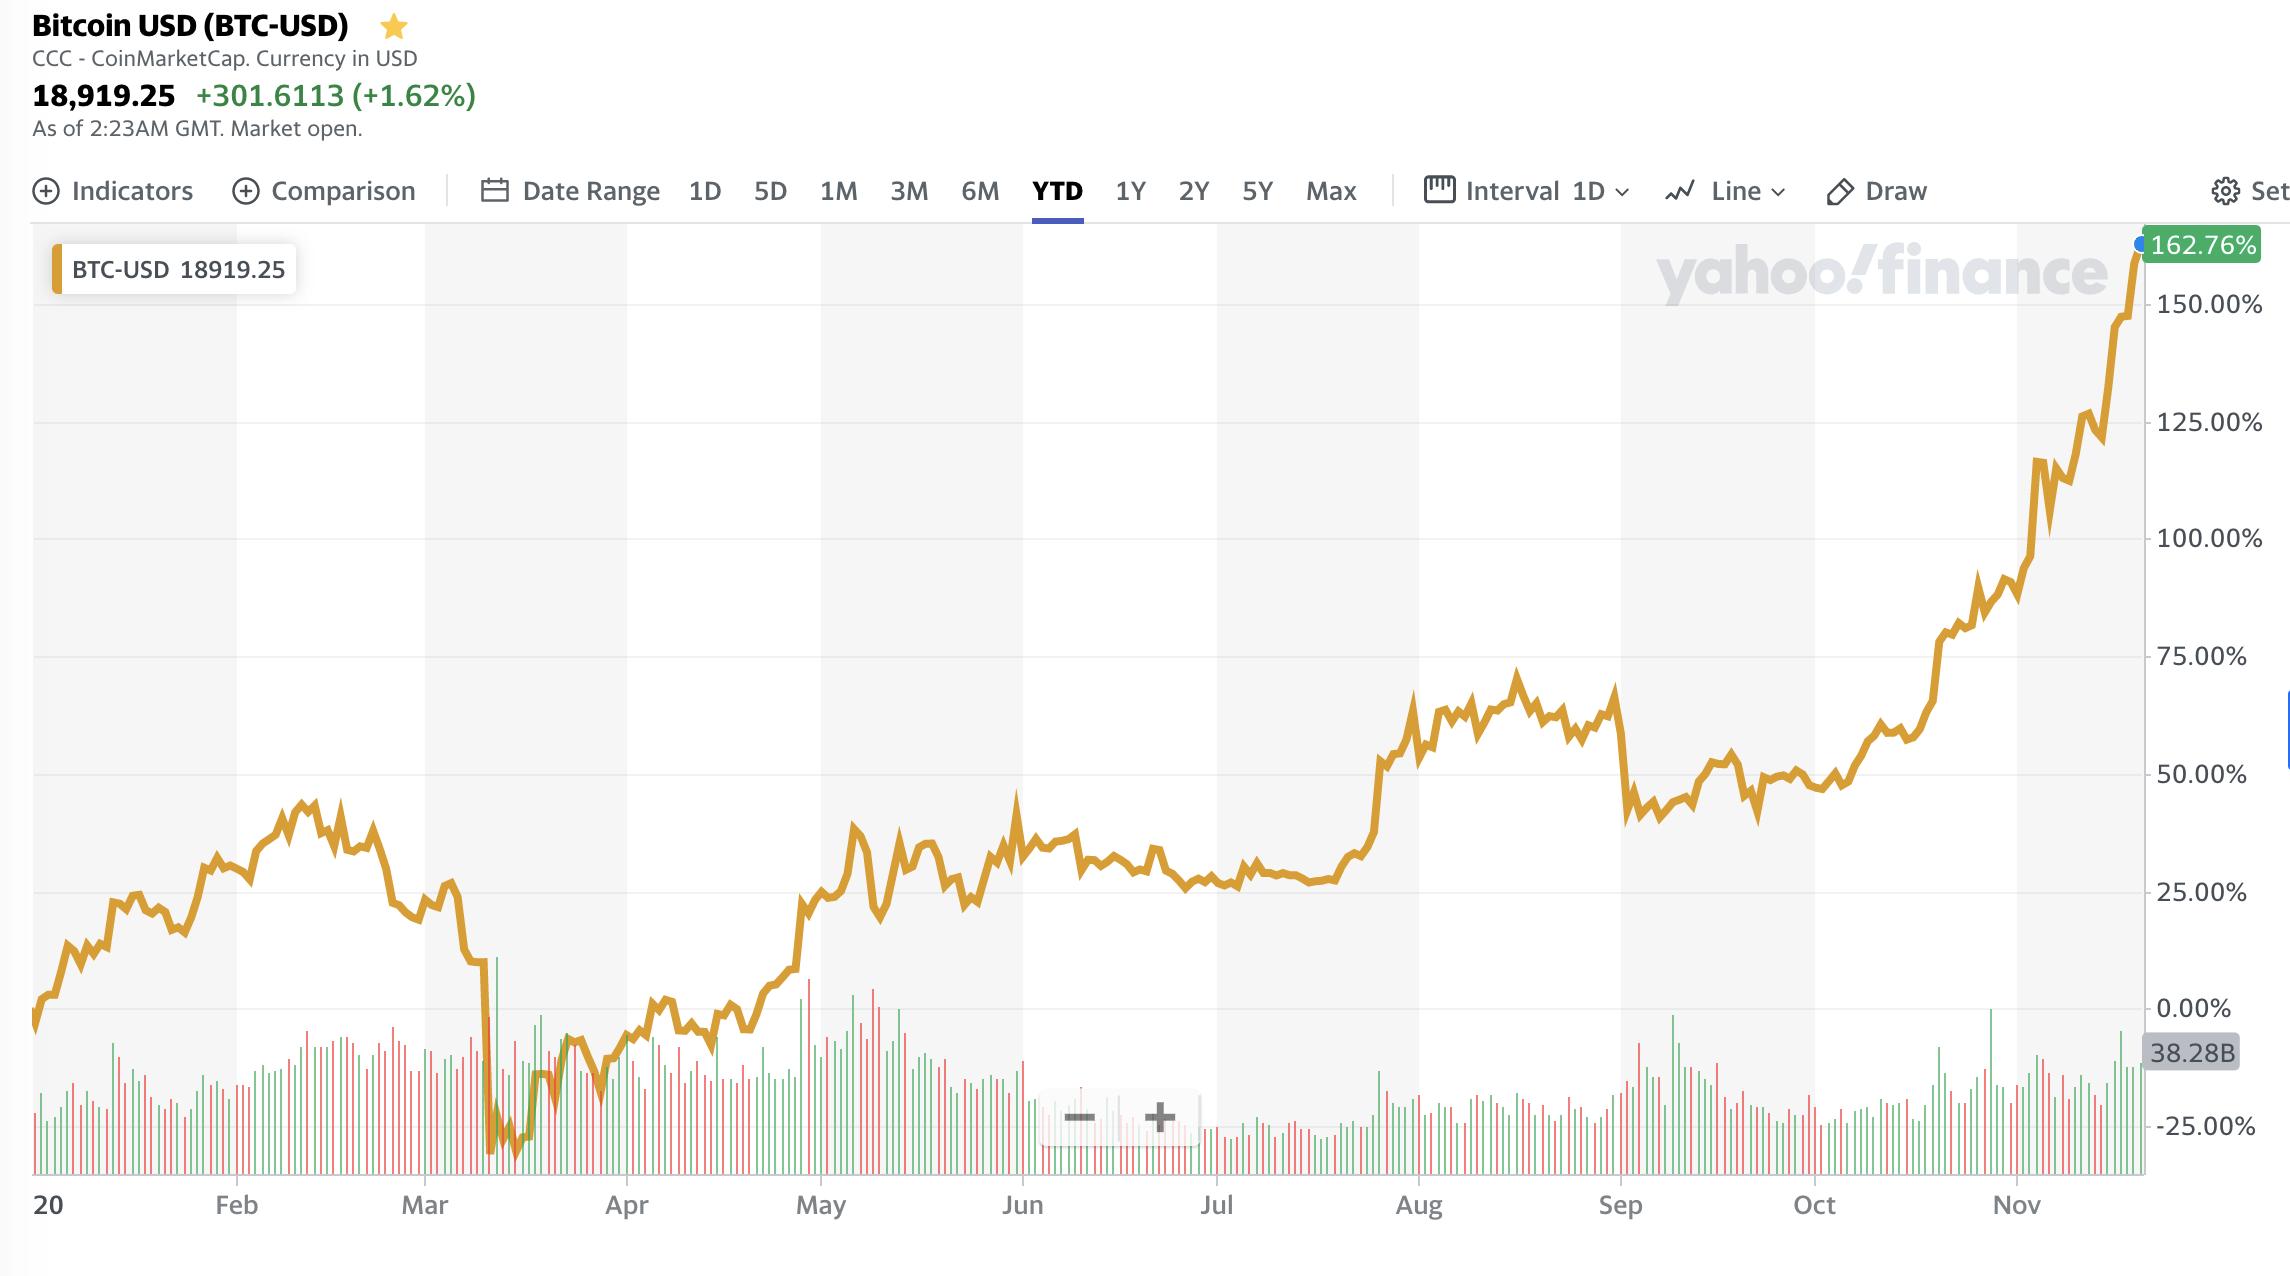 Bitcoin price in 2020, through Nov. 20 at 10pm EST.